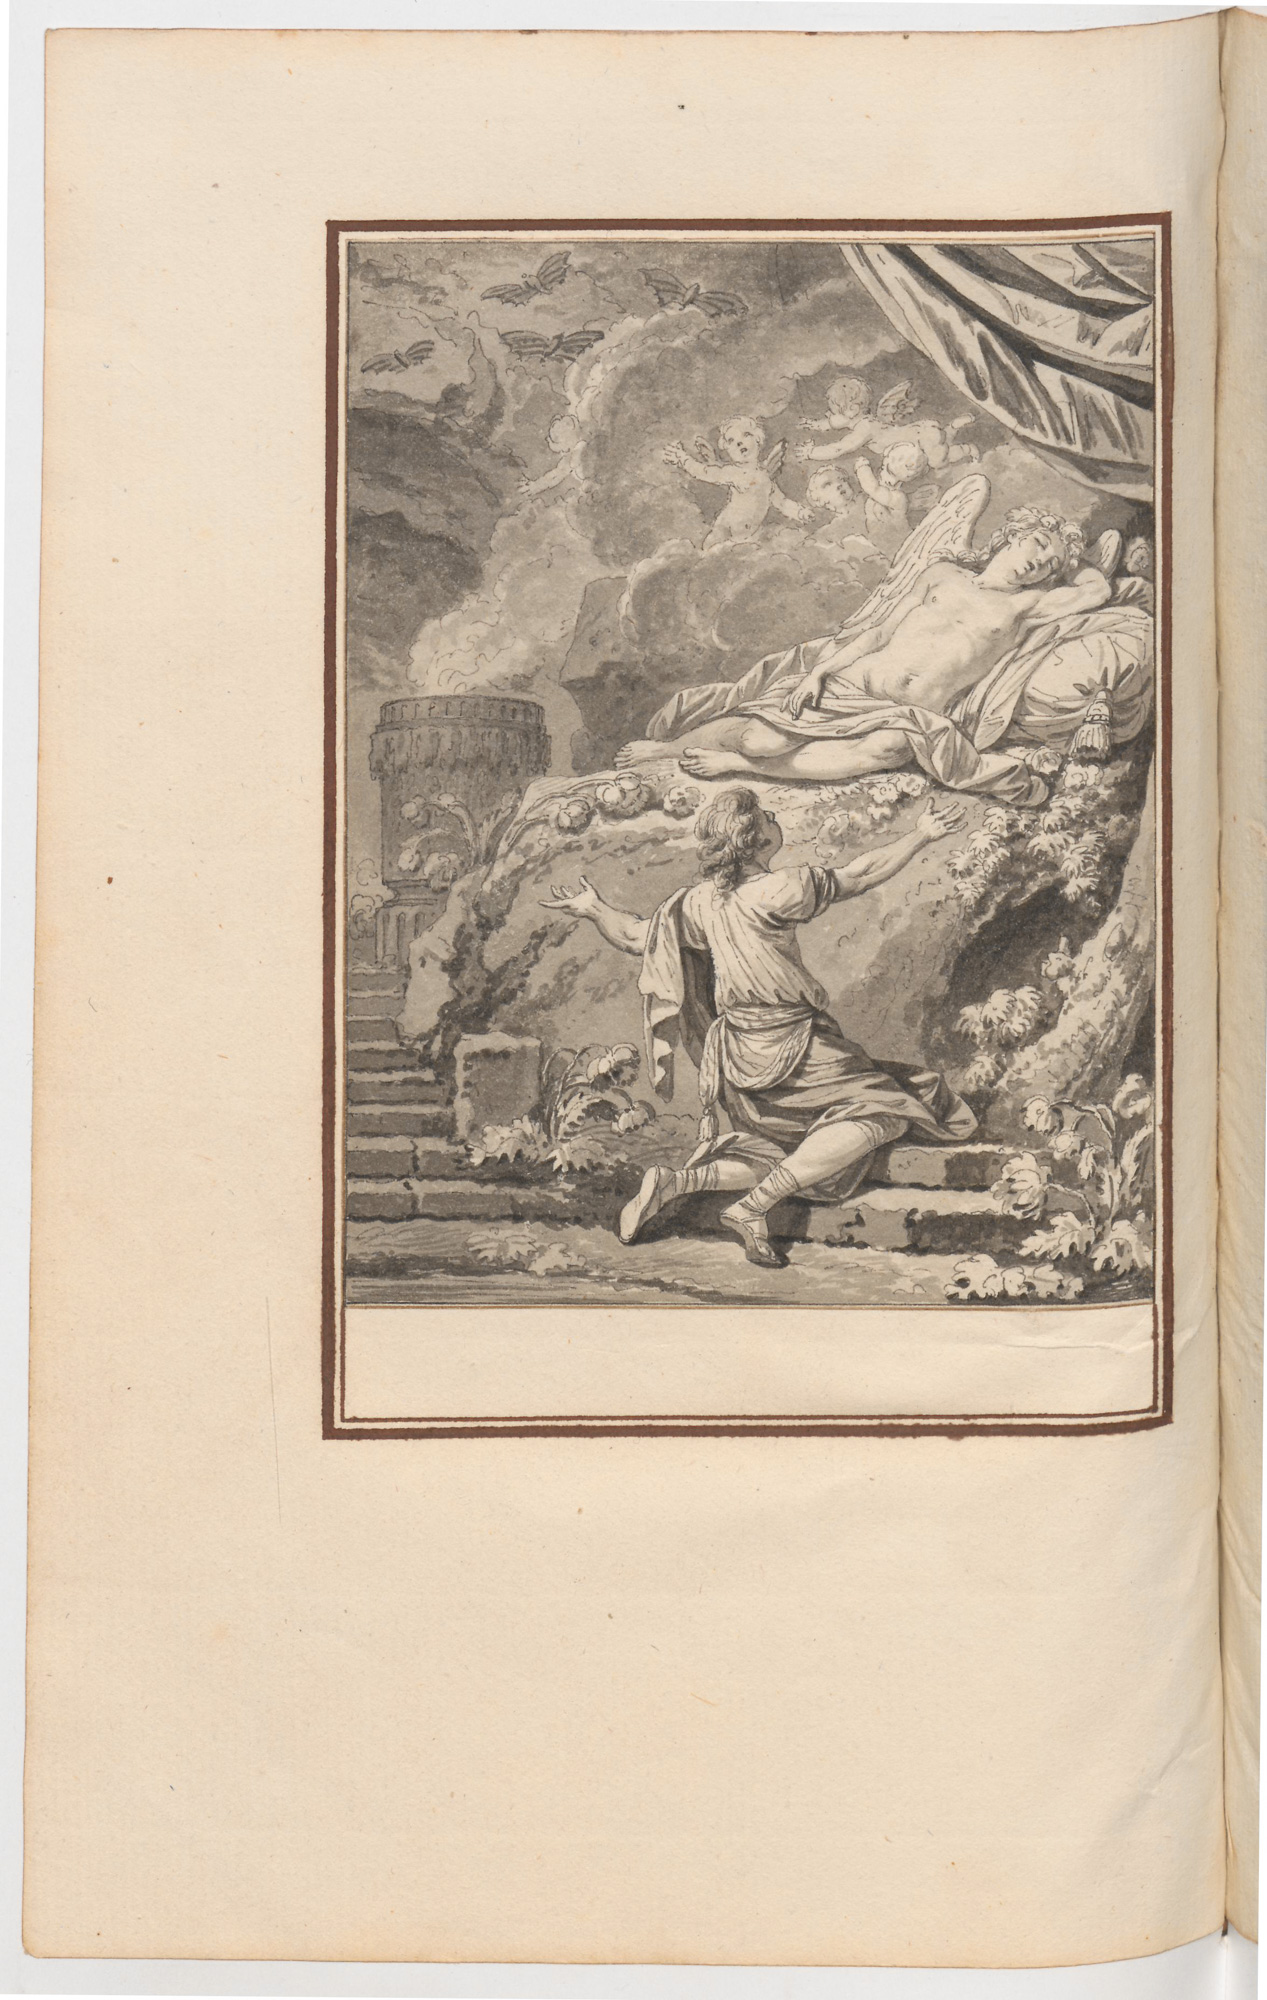 S.3.13 Priere a morphée, Chantilly, Image